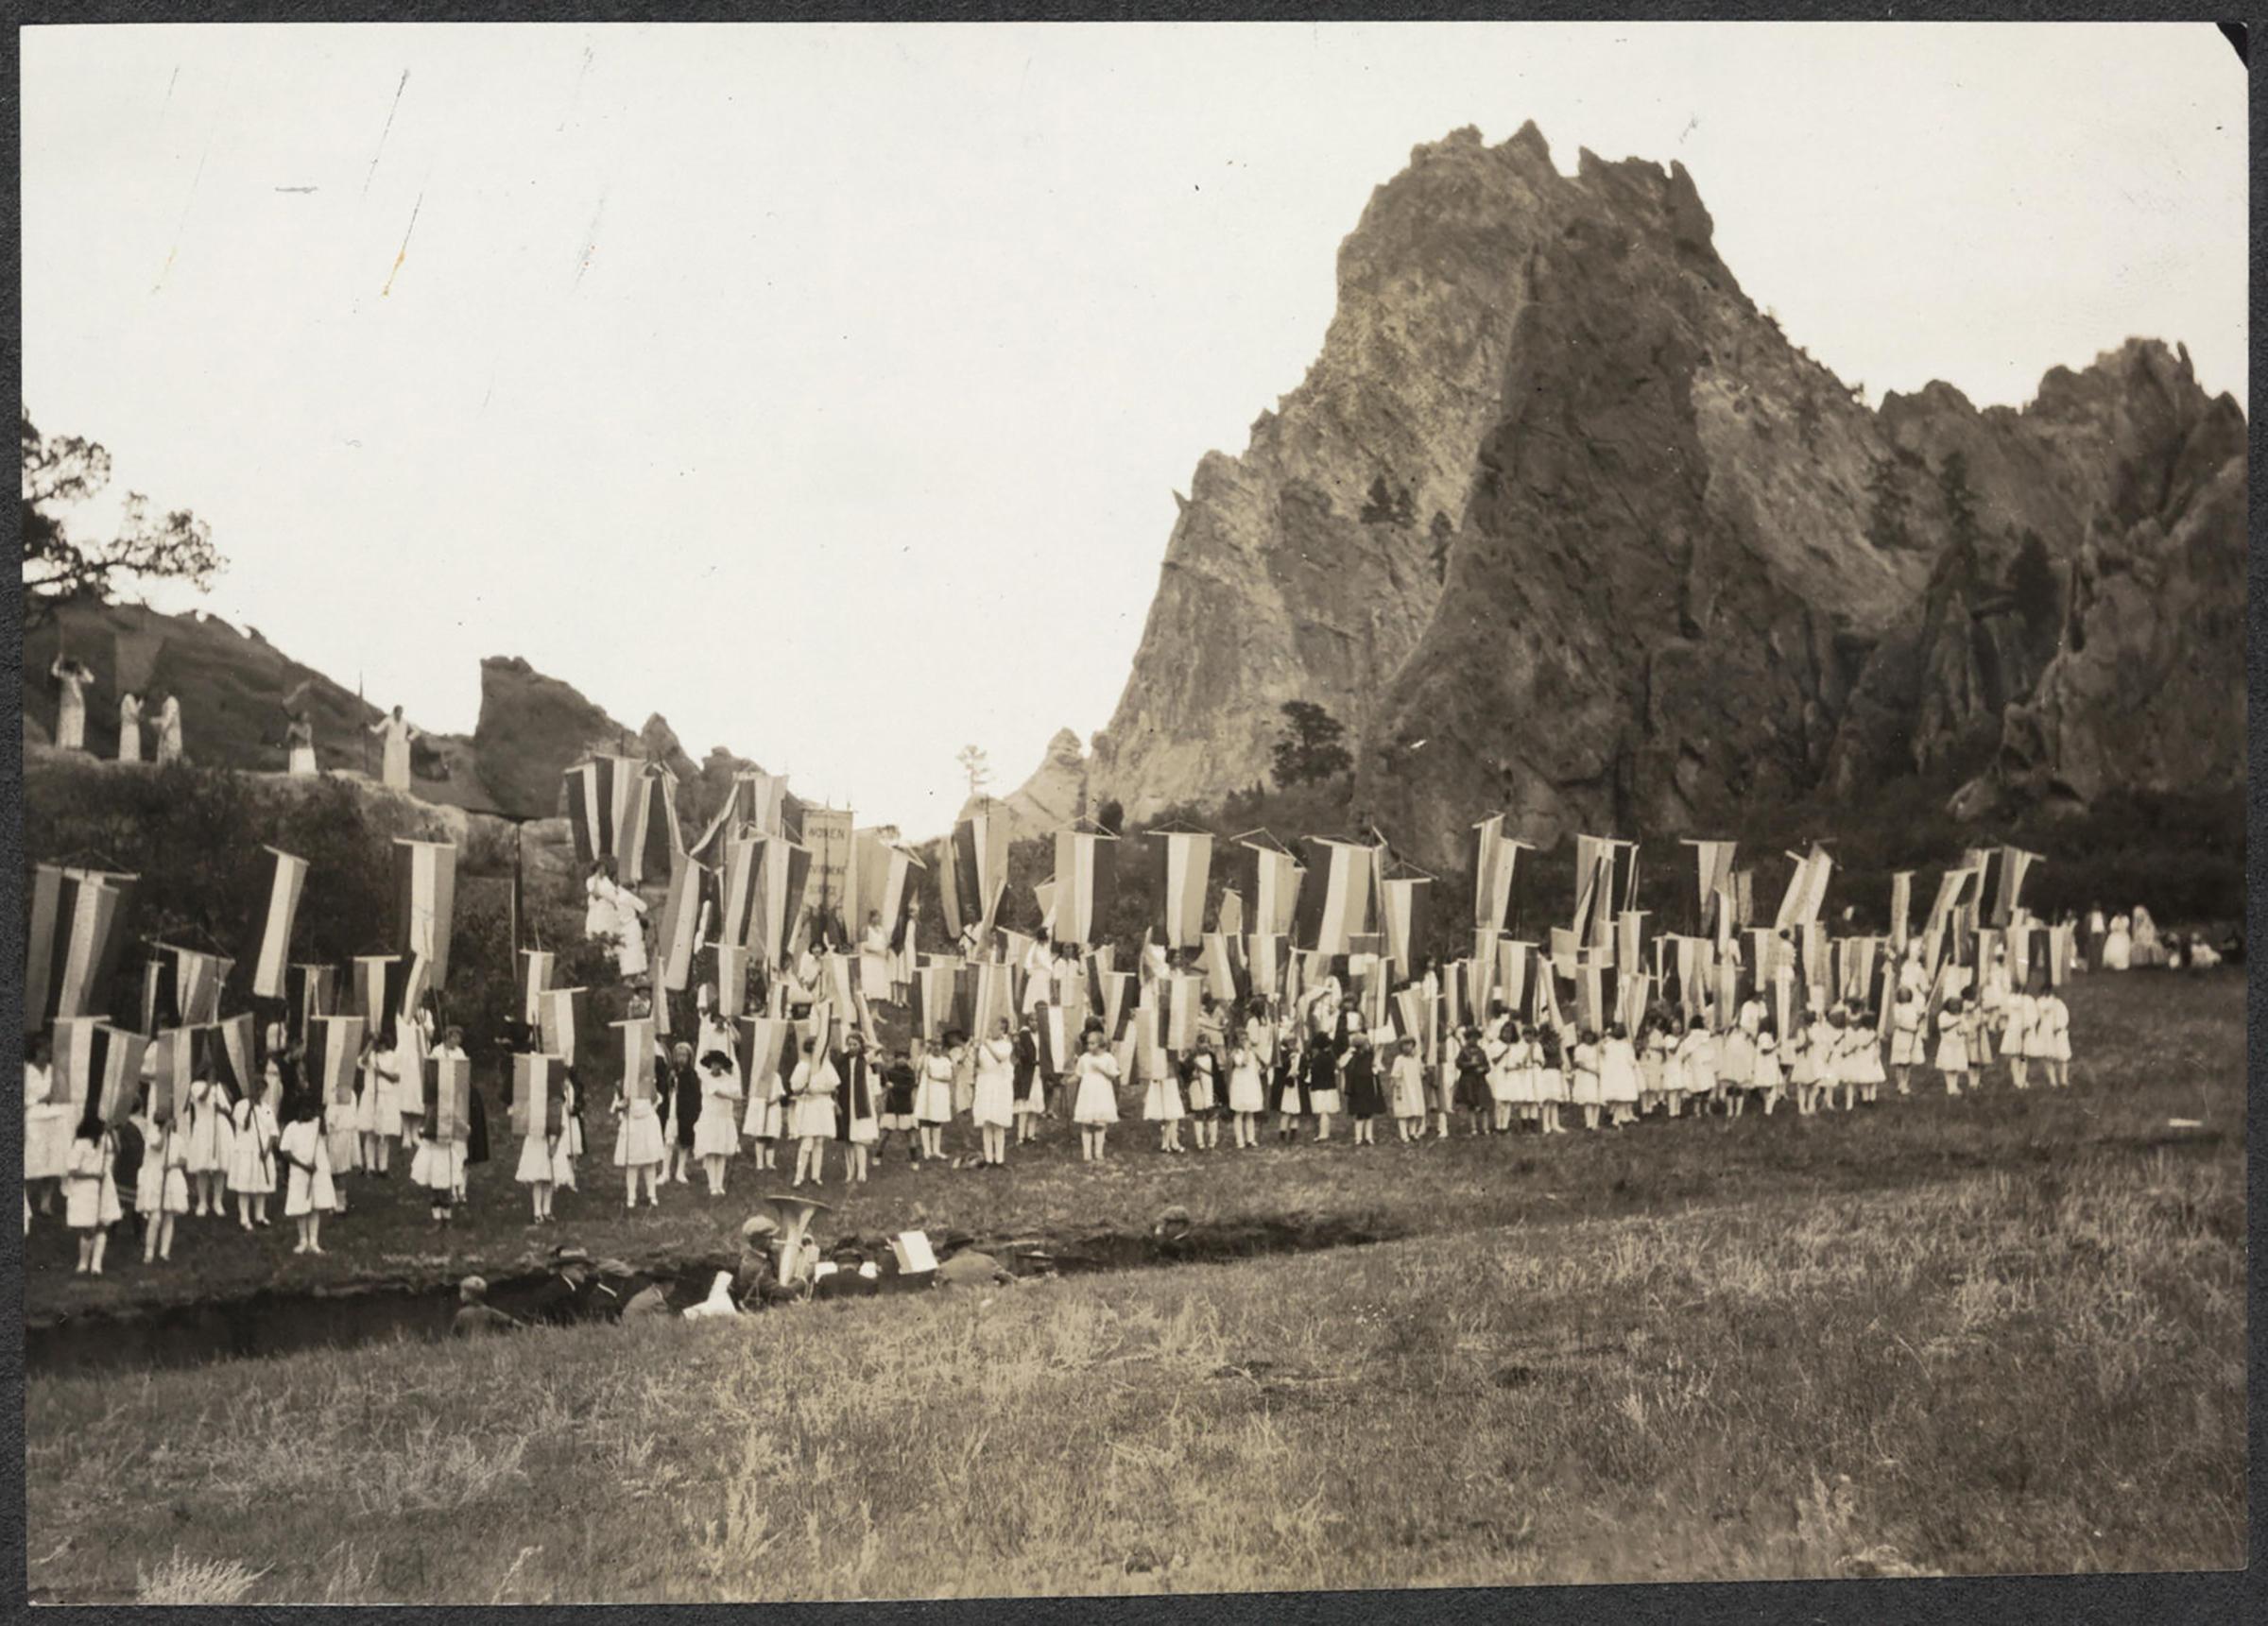 75th anniversary of the 1848 Seneca Falls Convention